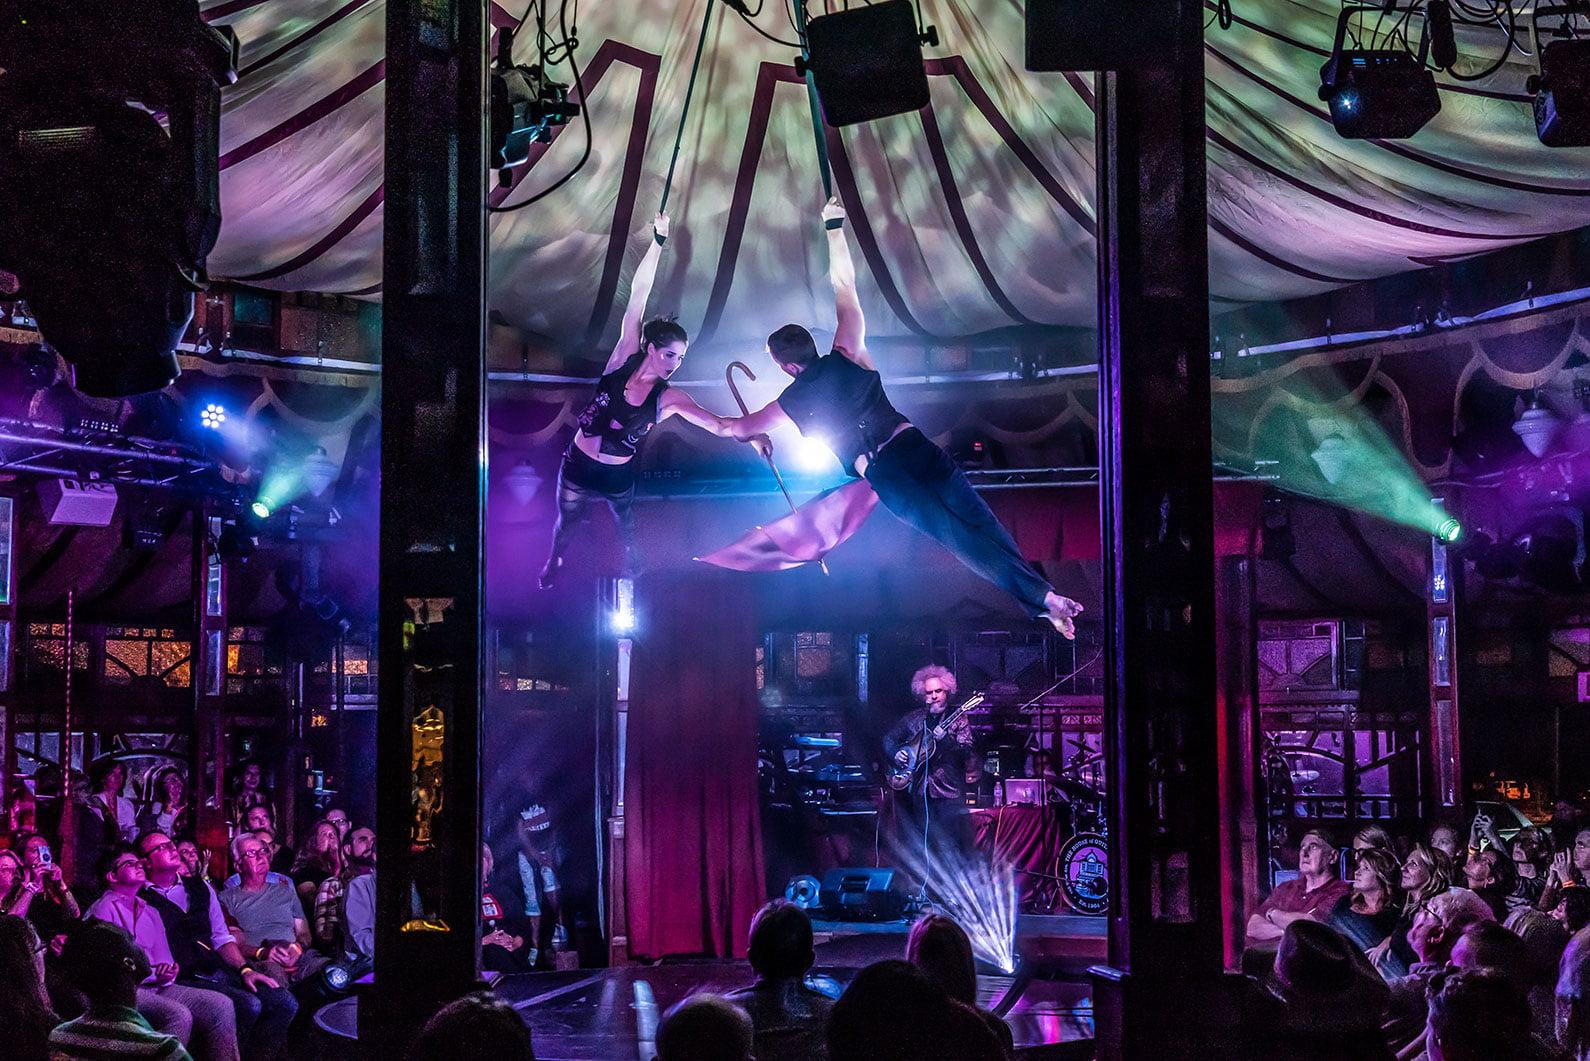 fringe festival acrobats